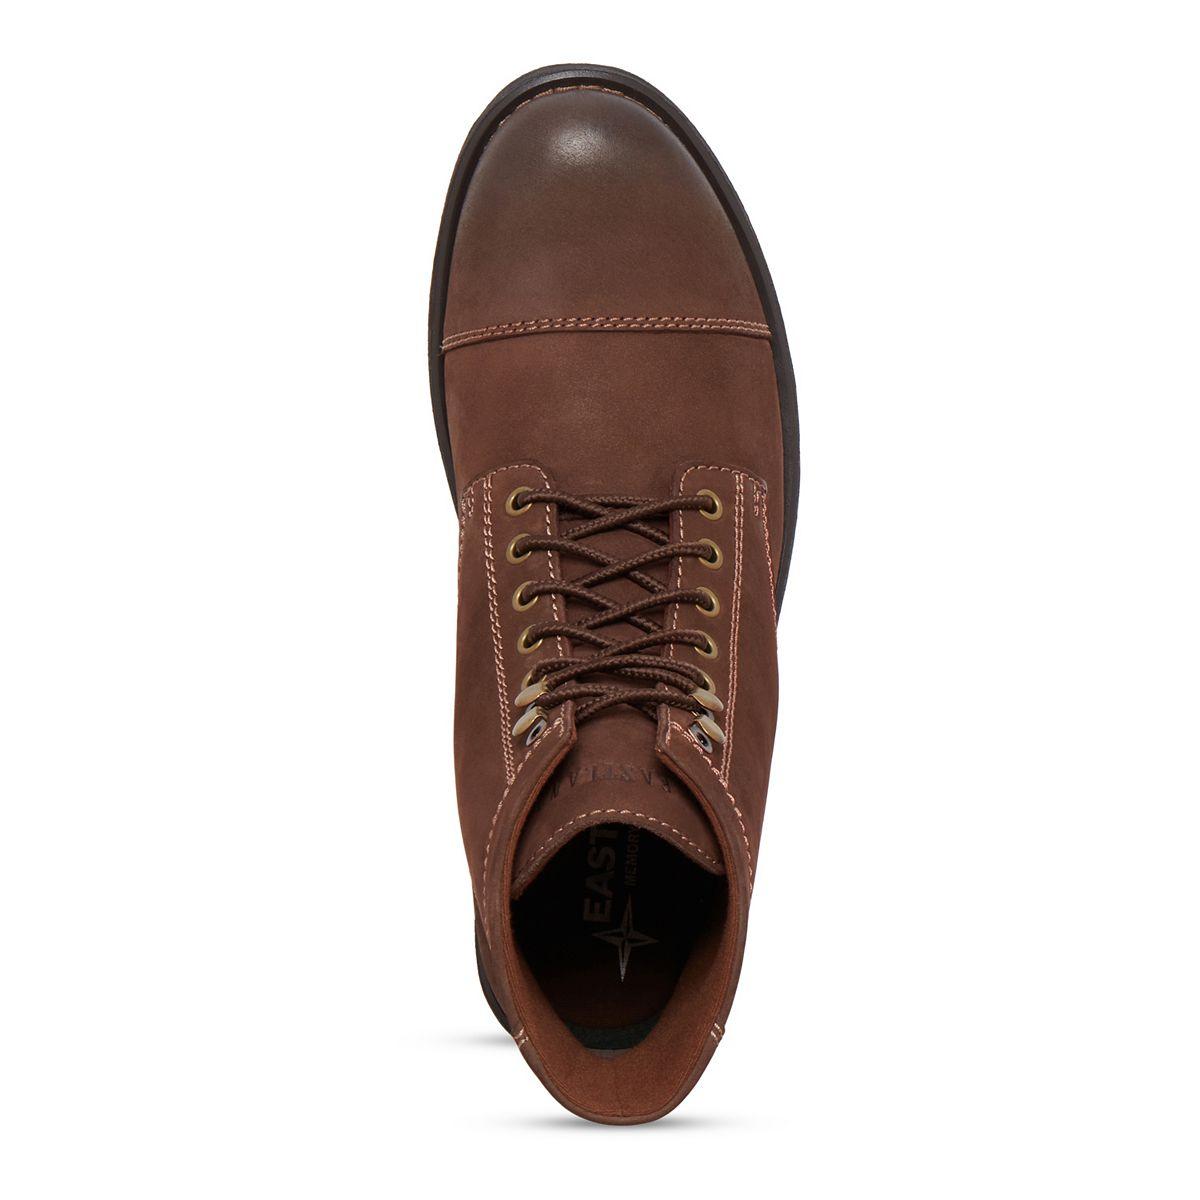 Eastland High Fidelity Men's Ankle Boots Tan 0no8Z